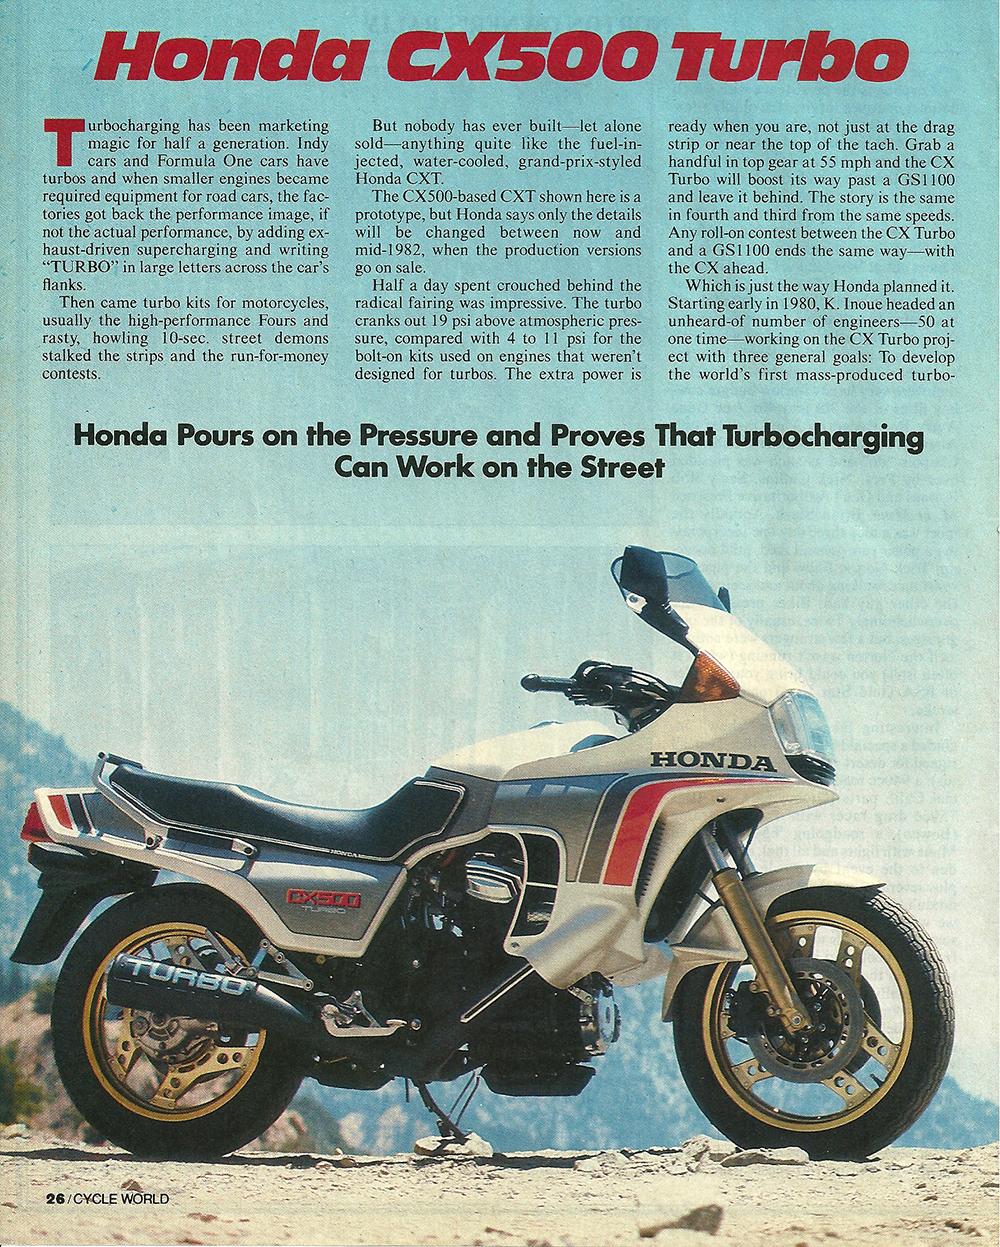 1981 Honda CX500 Turbo road test 1.jpg